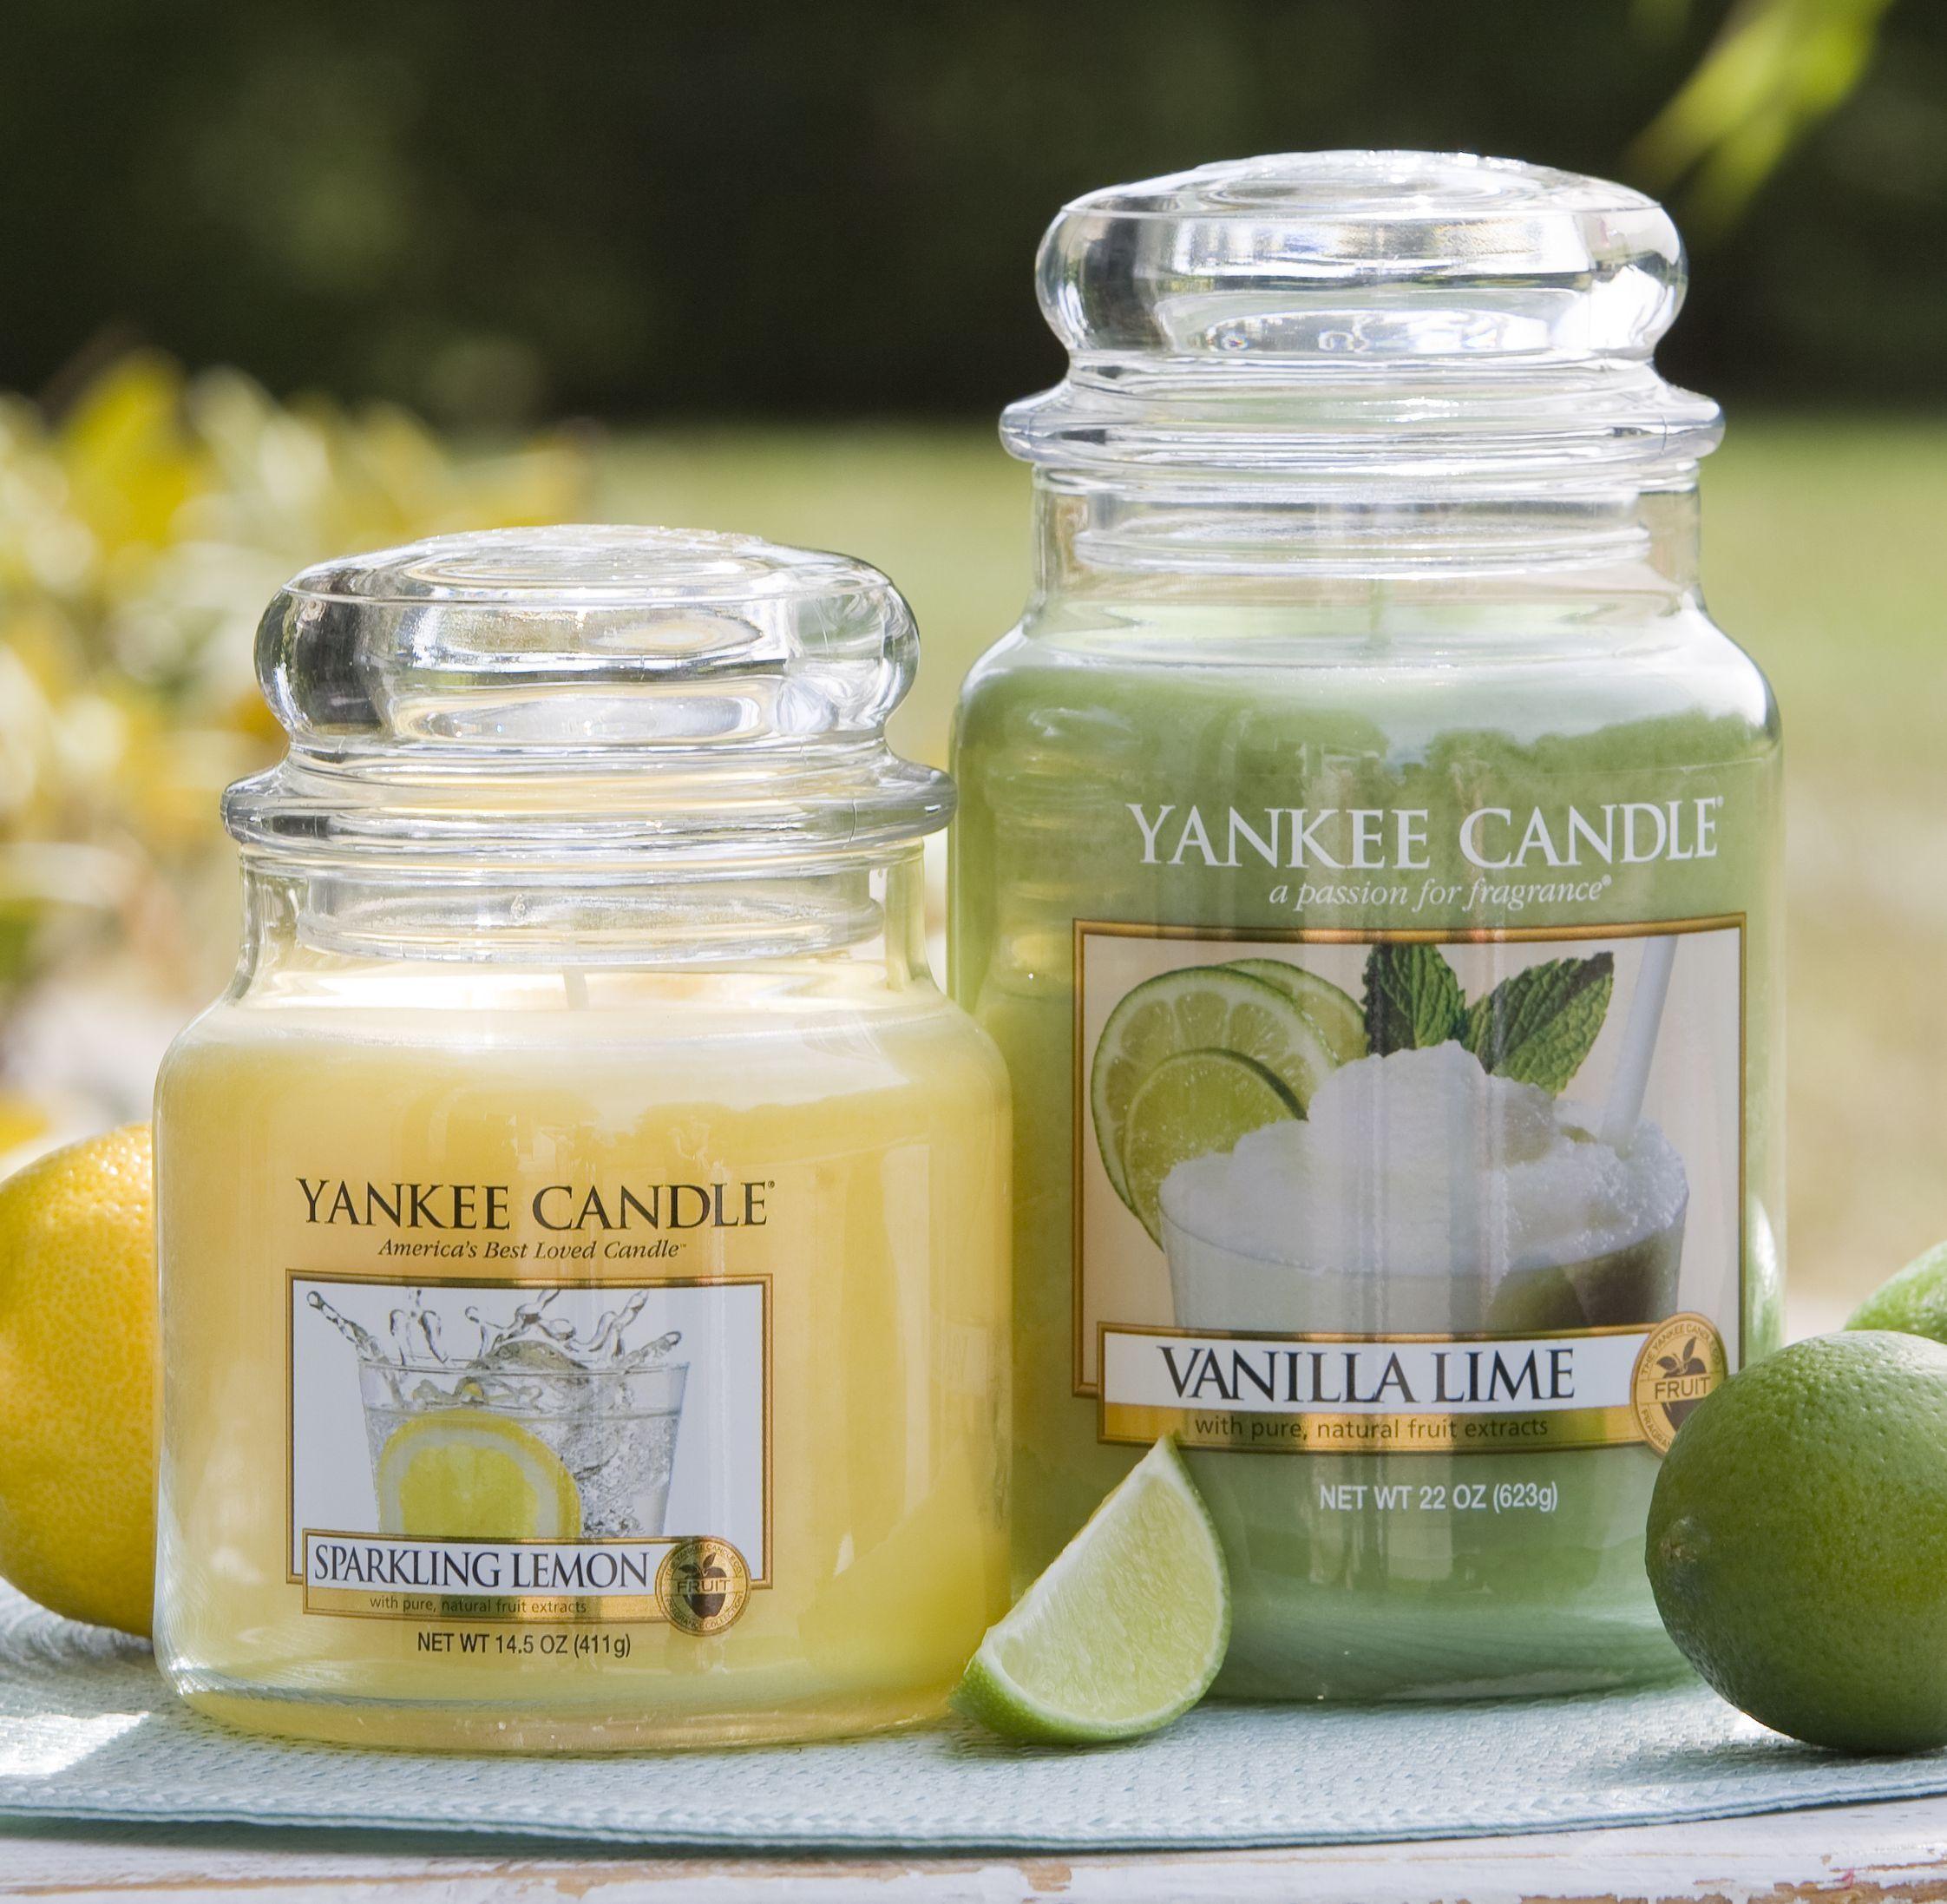 Vanilla lime sparkling lemon yankeecandle myrelaxingrituals